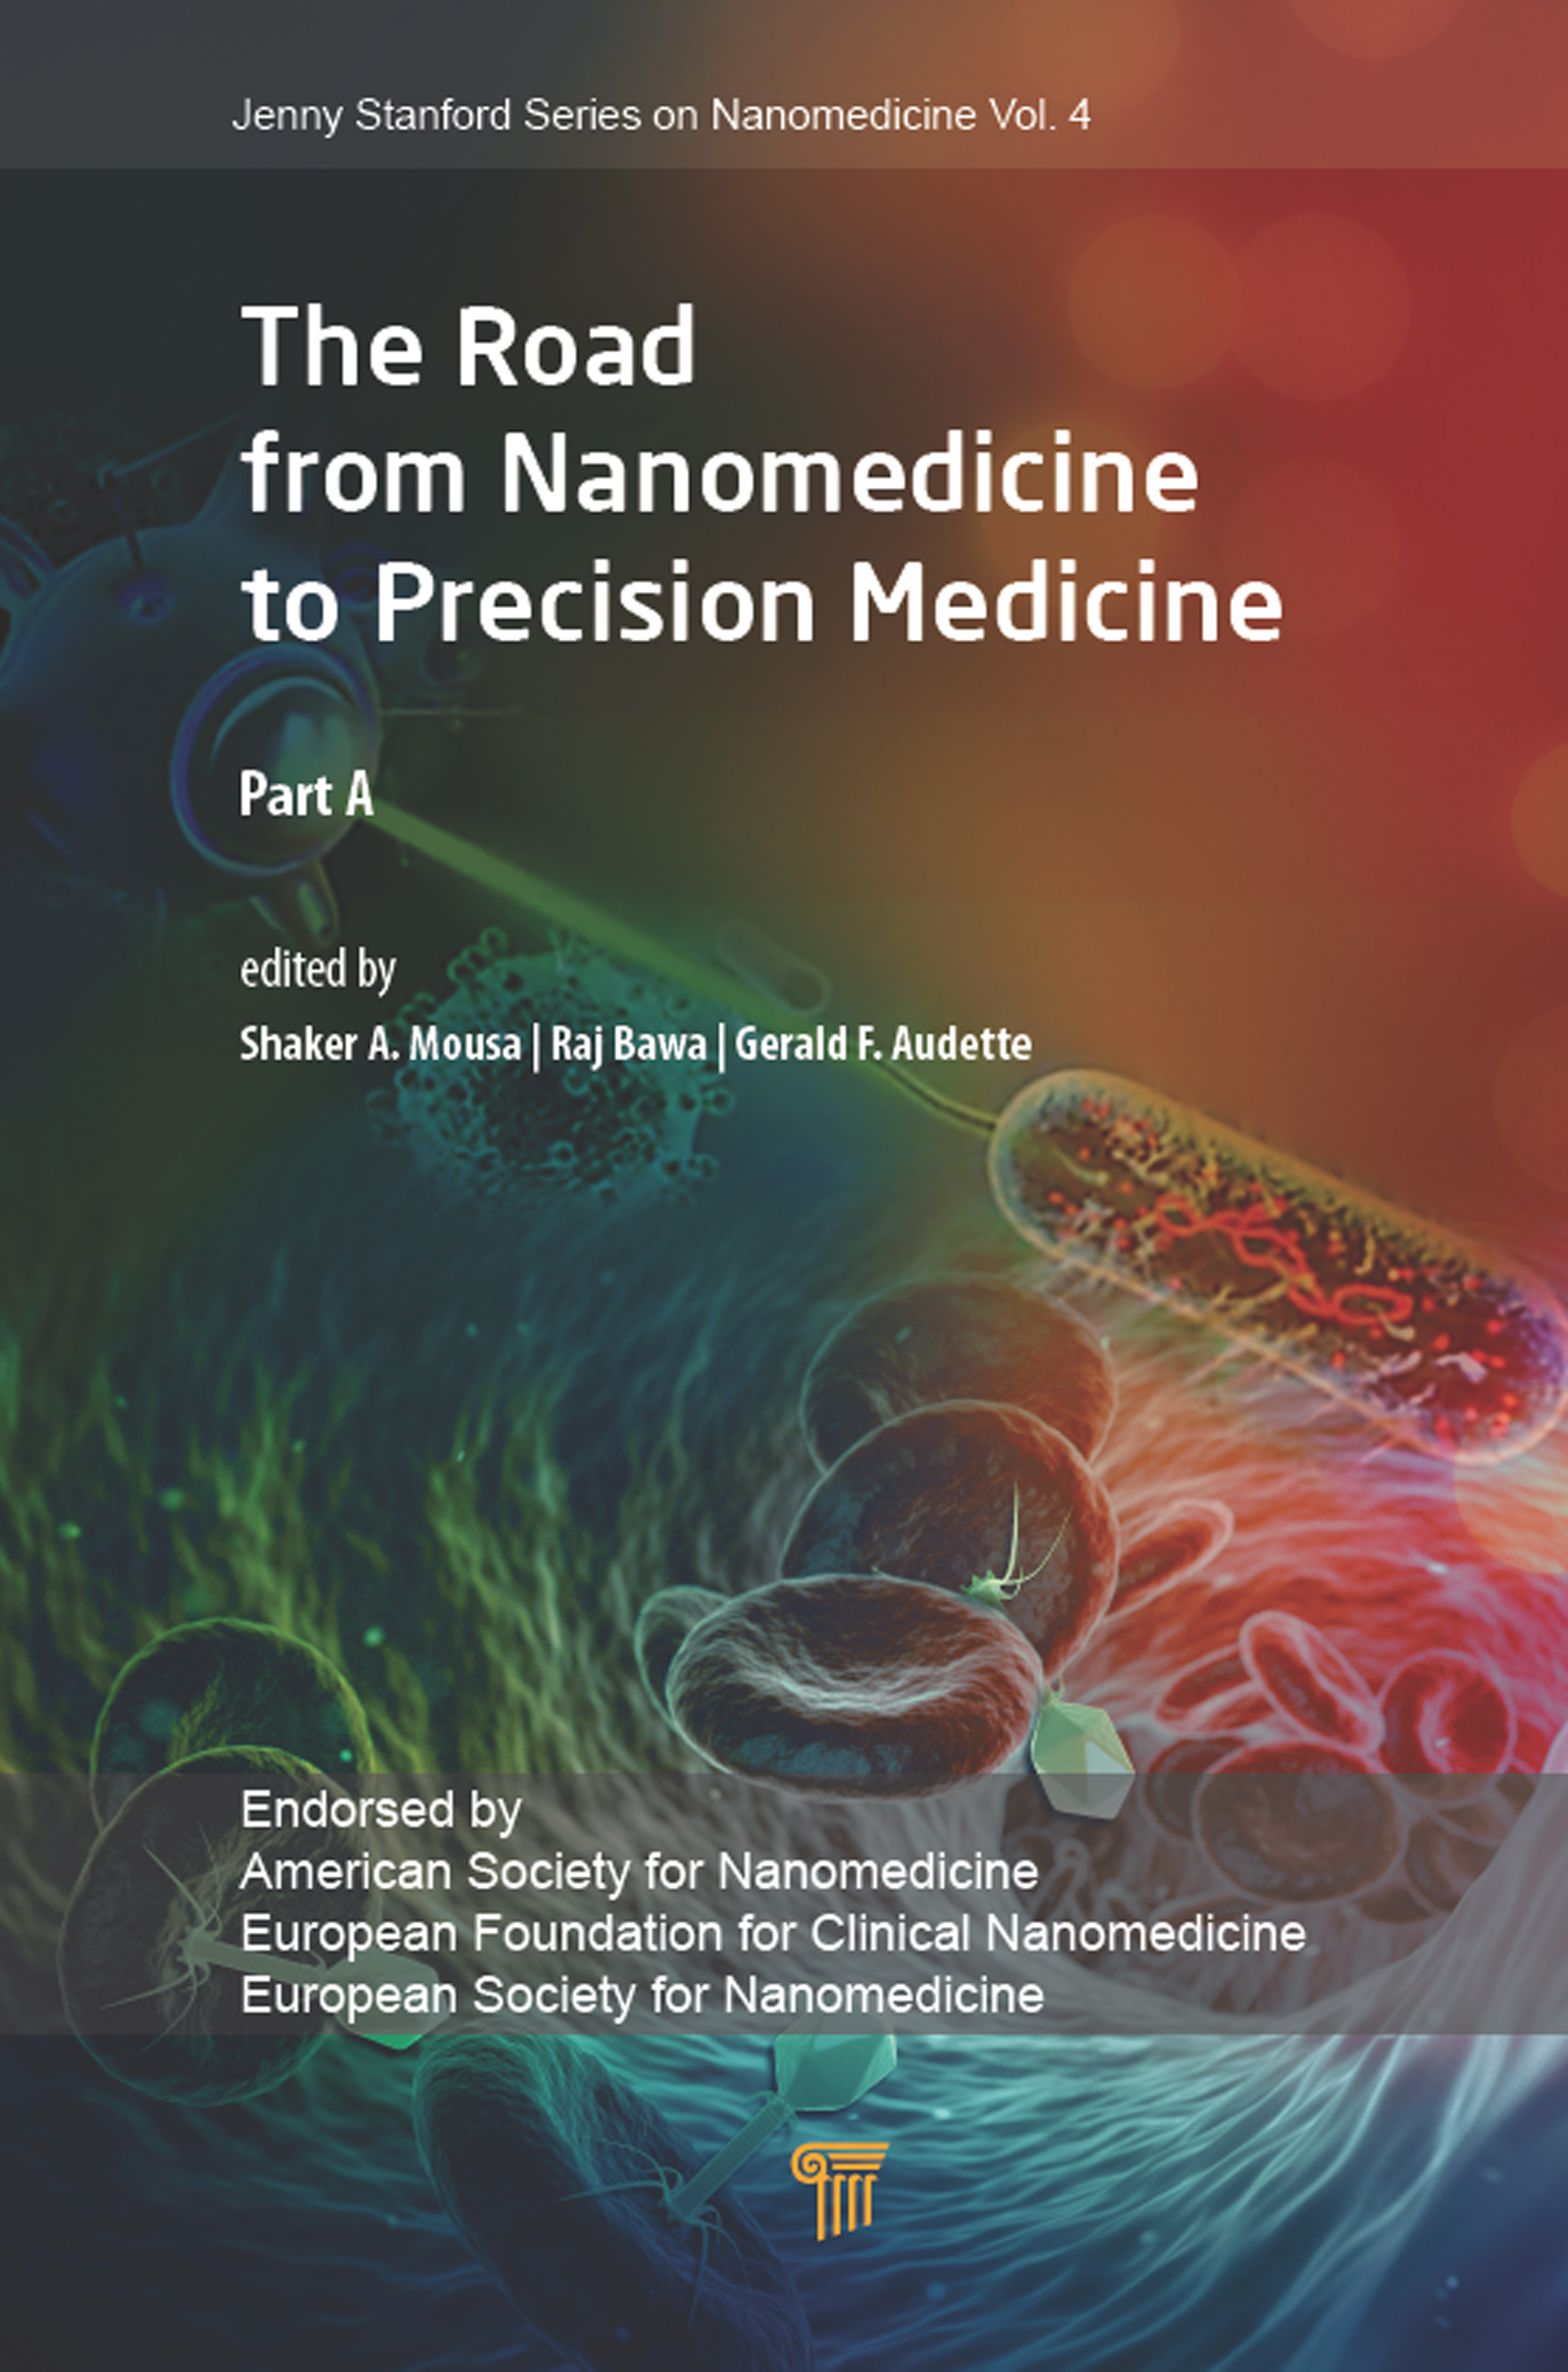 Advancing Precision Medicine: Tailoring Personalized Therapies